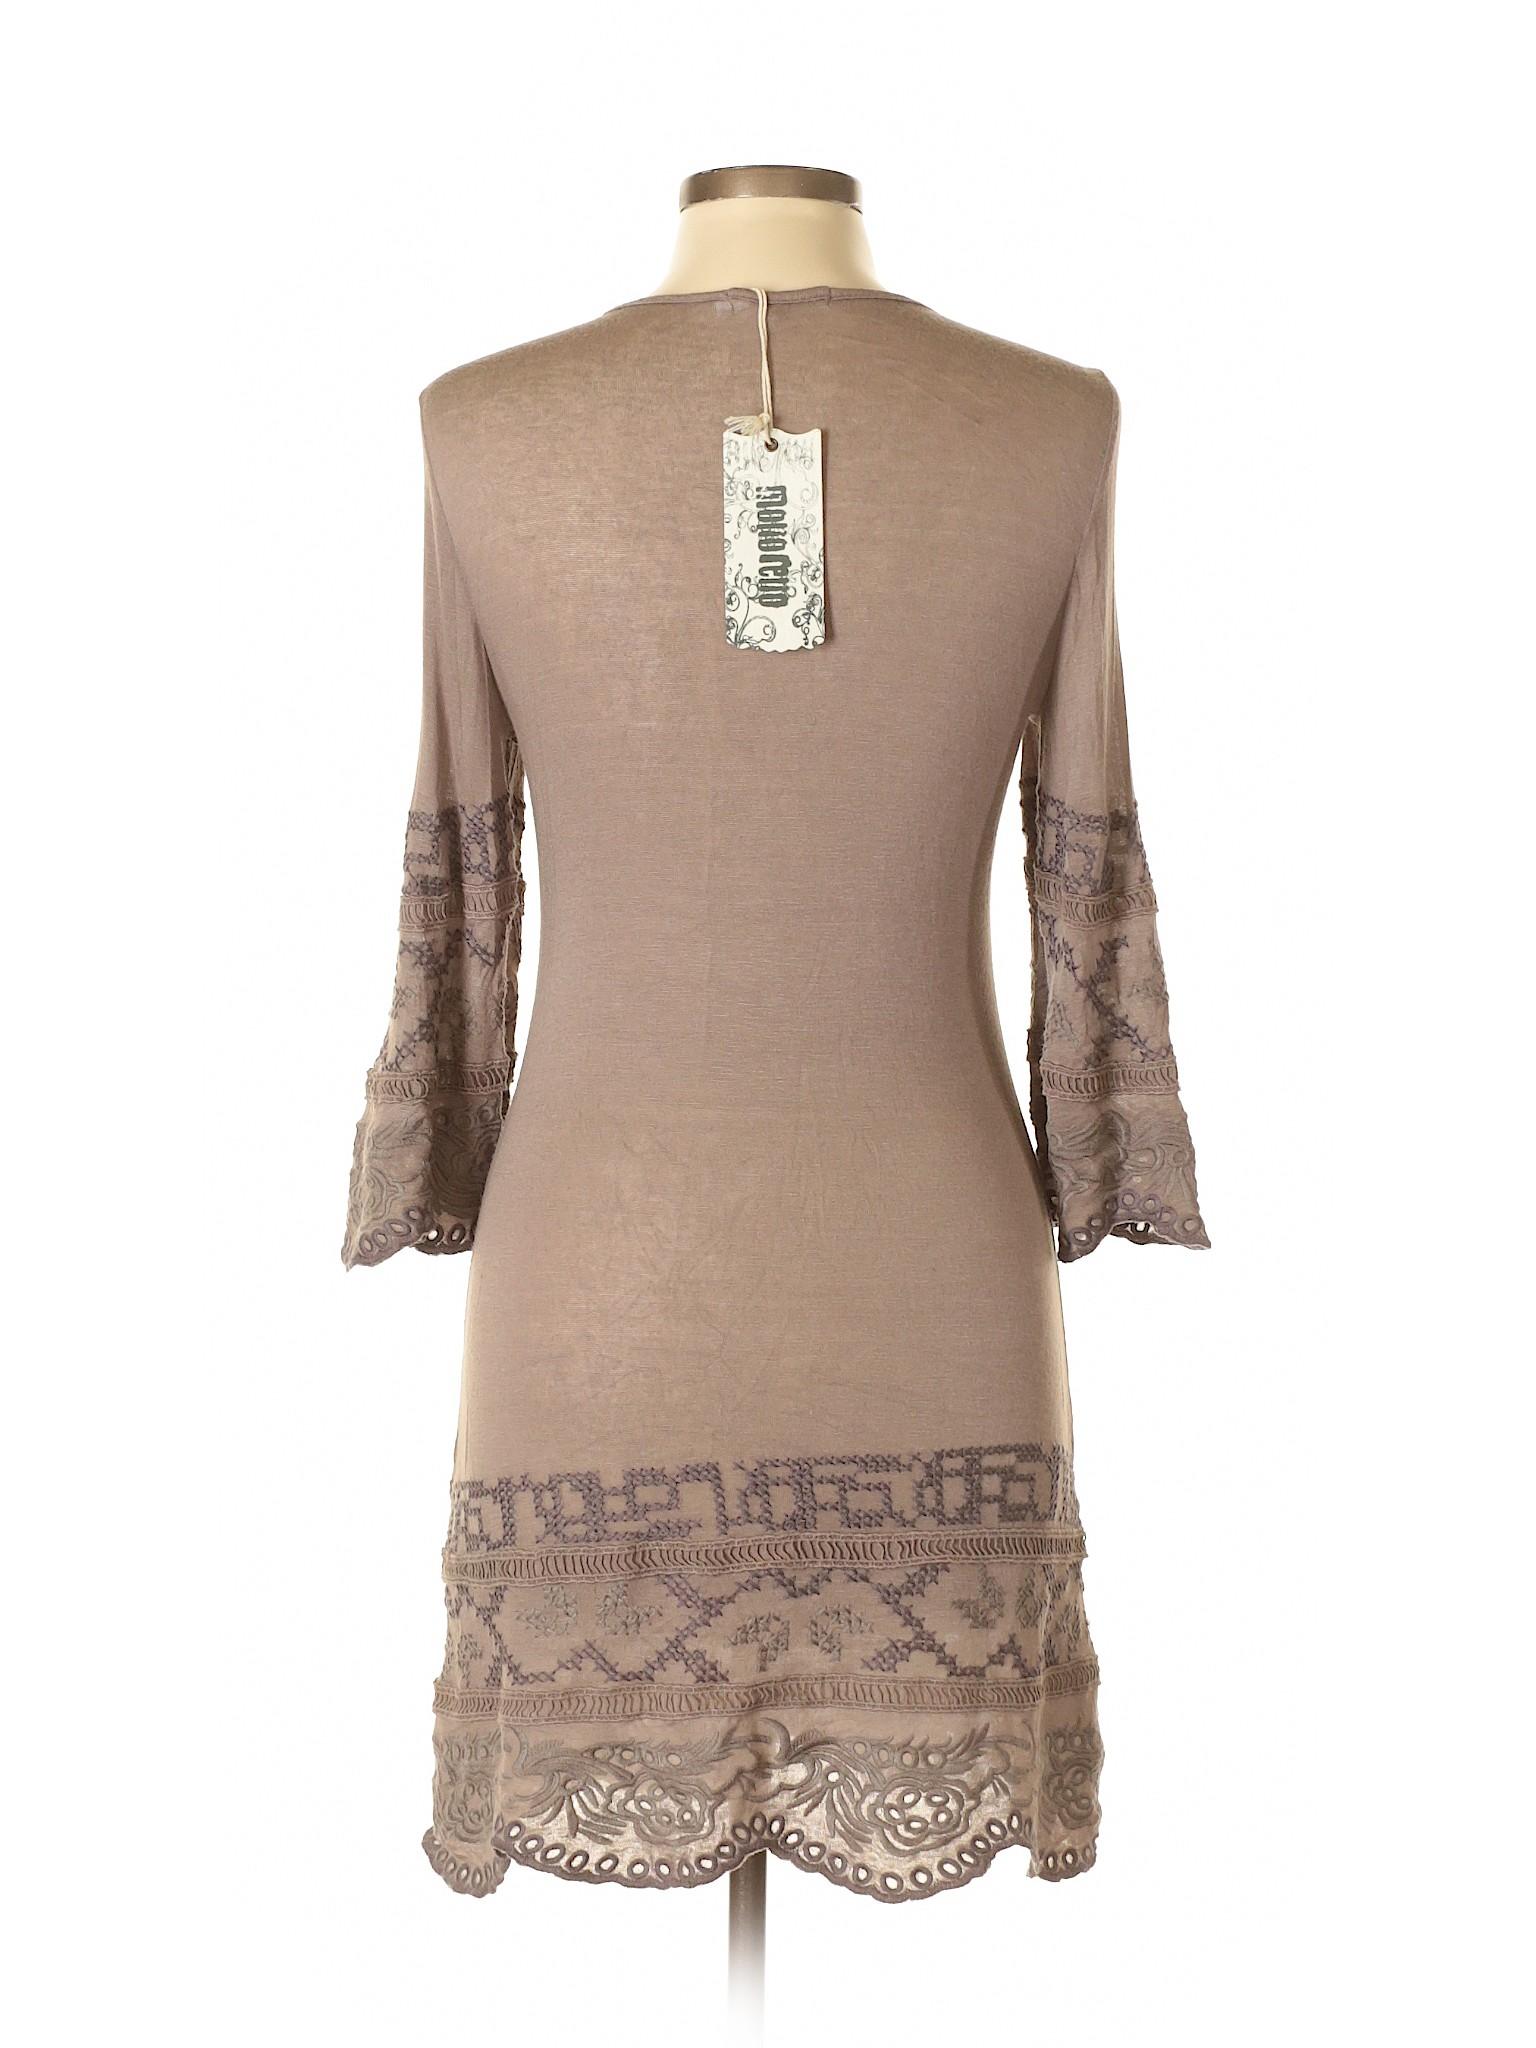 winter MONORENO Casual Casual MONORENO winter Dress Dress Boutique Boutique pxCX1FYnwq